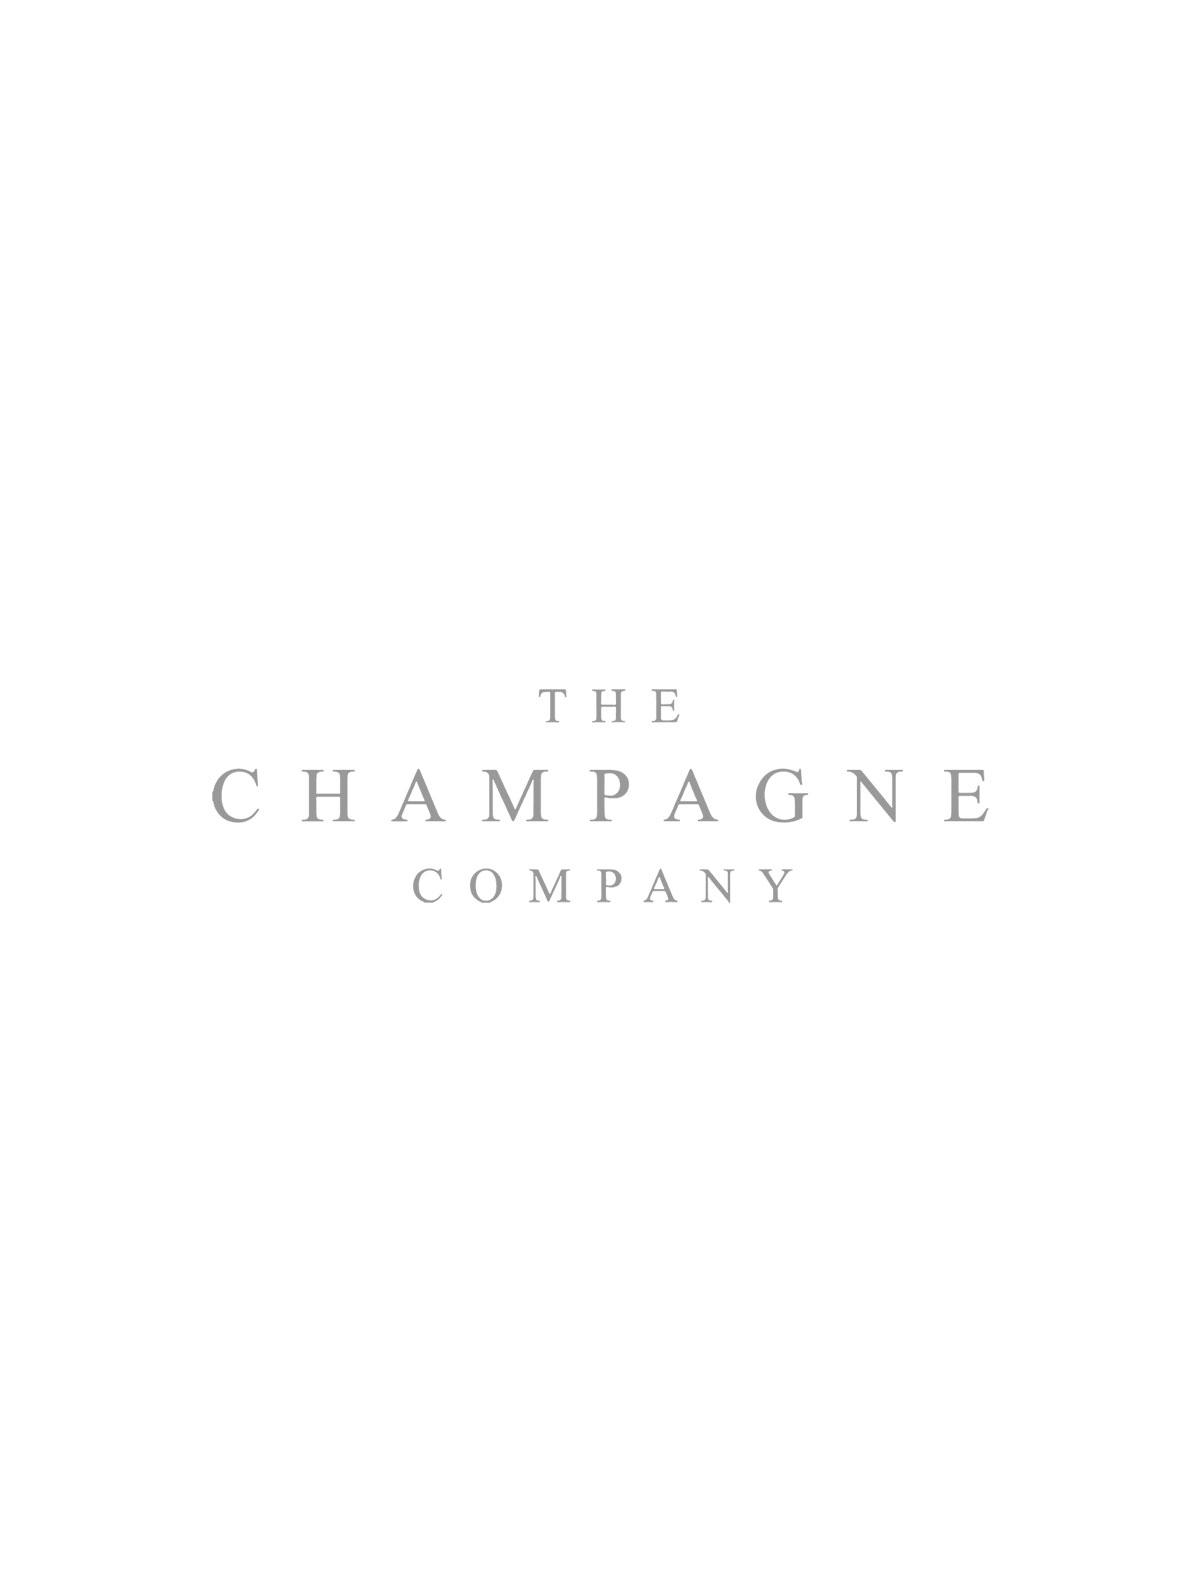 Riedel Vinum Champagne Flutes (Set of 2) Gift Boxed